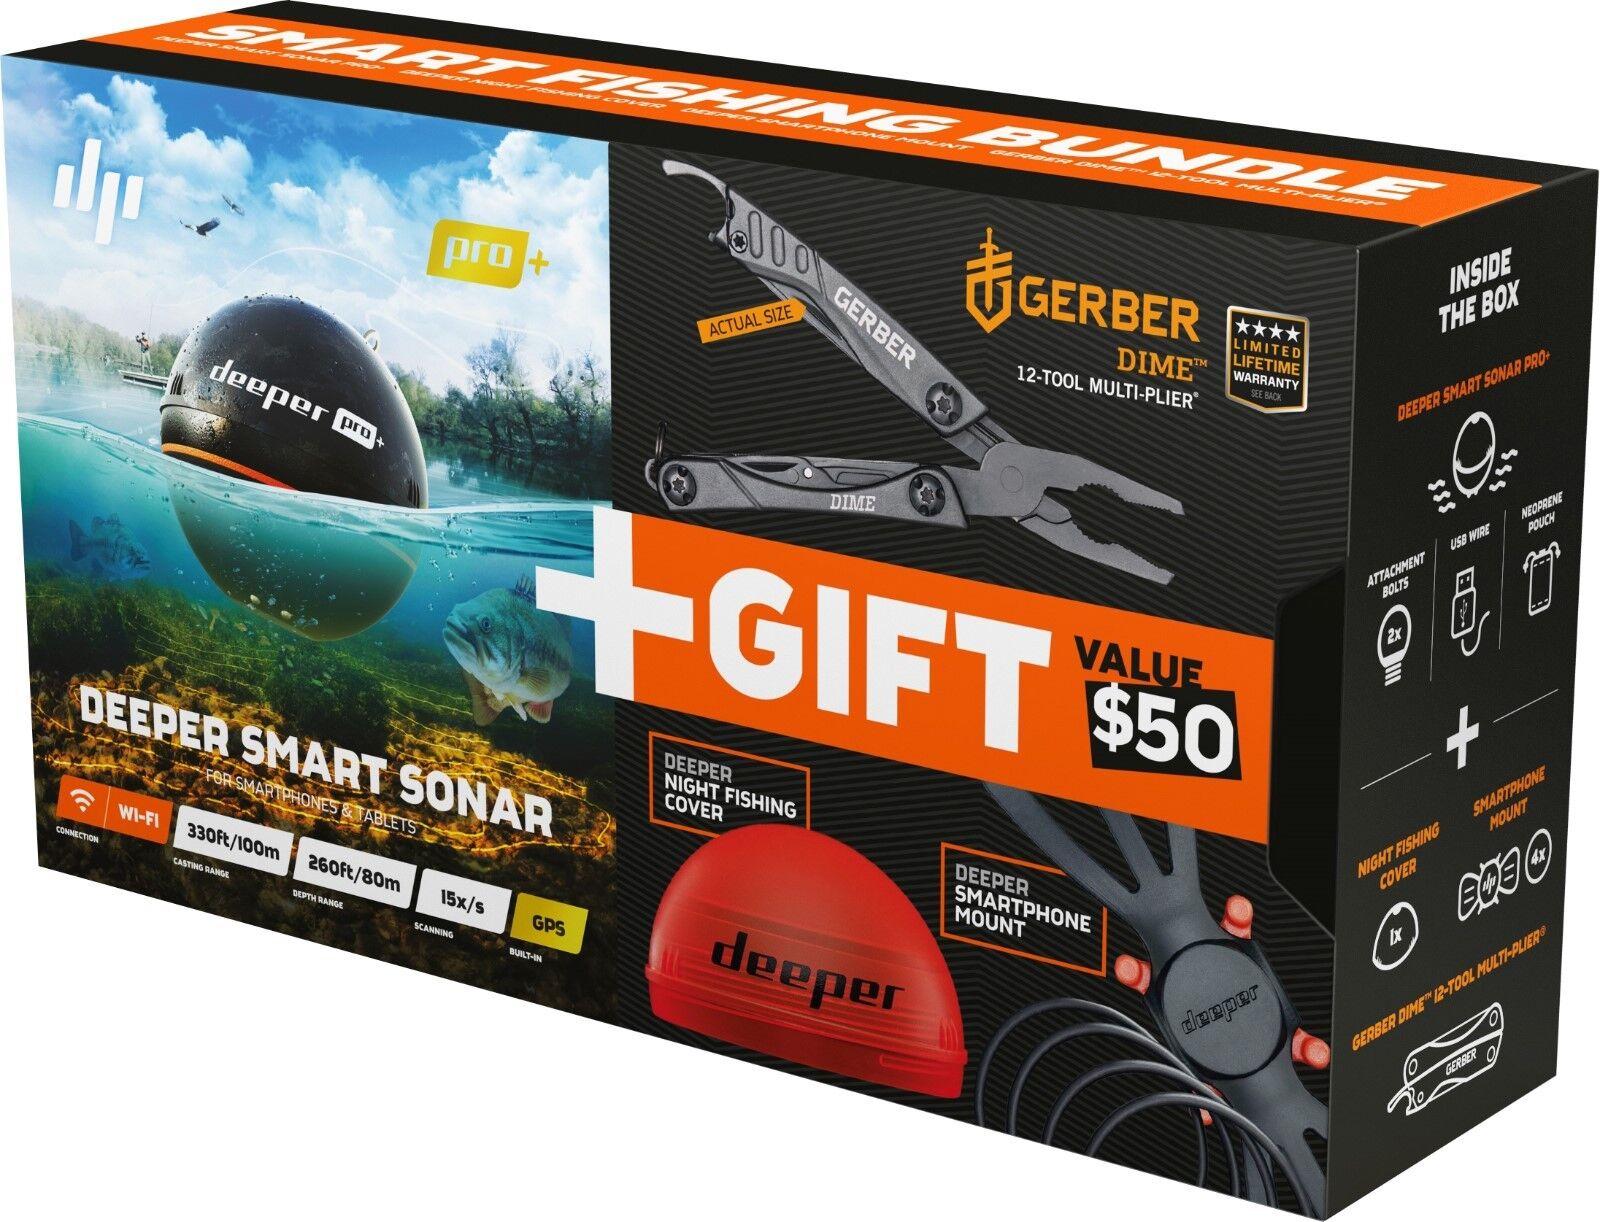 Deeper Deeper Deeper Pro Plus GPS Smart Sonar Blautooth Fish Finder Xmas Bundle -X9015- c72a36